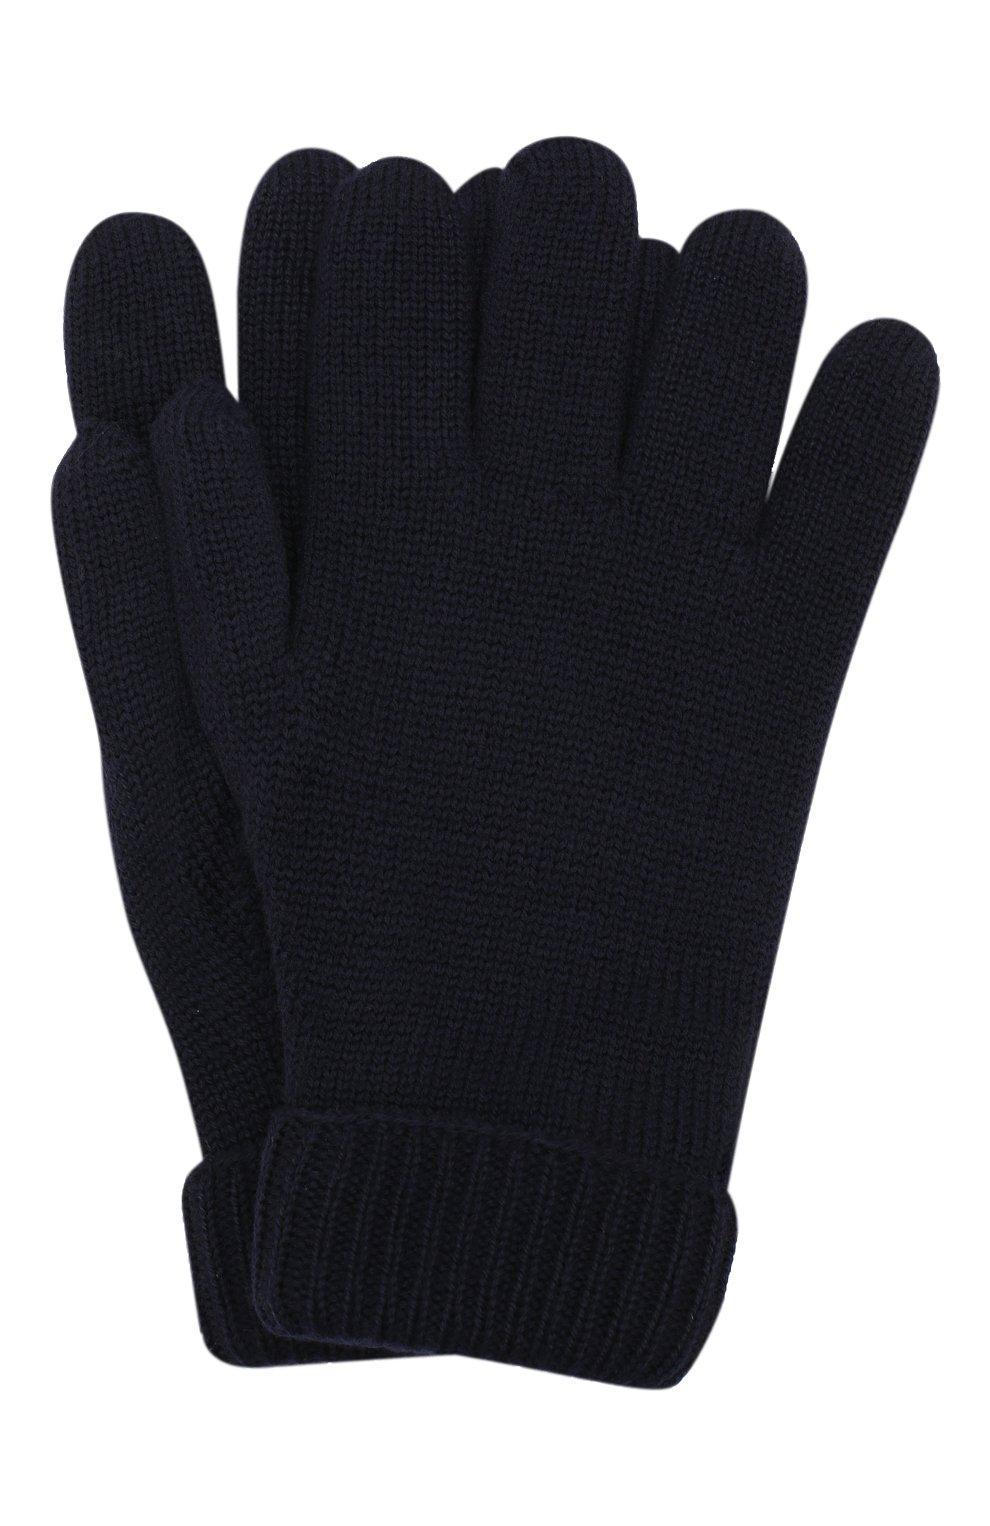 Детские шерстяные перчатки IL TRENINO темно-синего цвета, арт. 19 9008/E0 | Фото 1